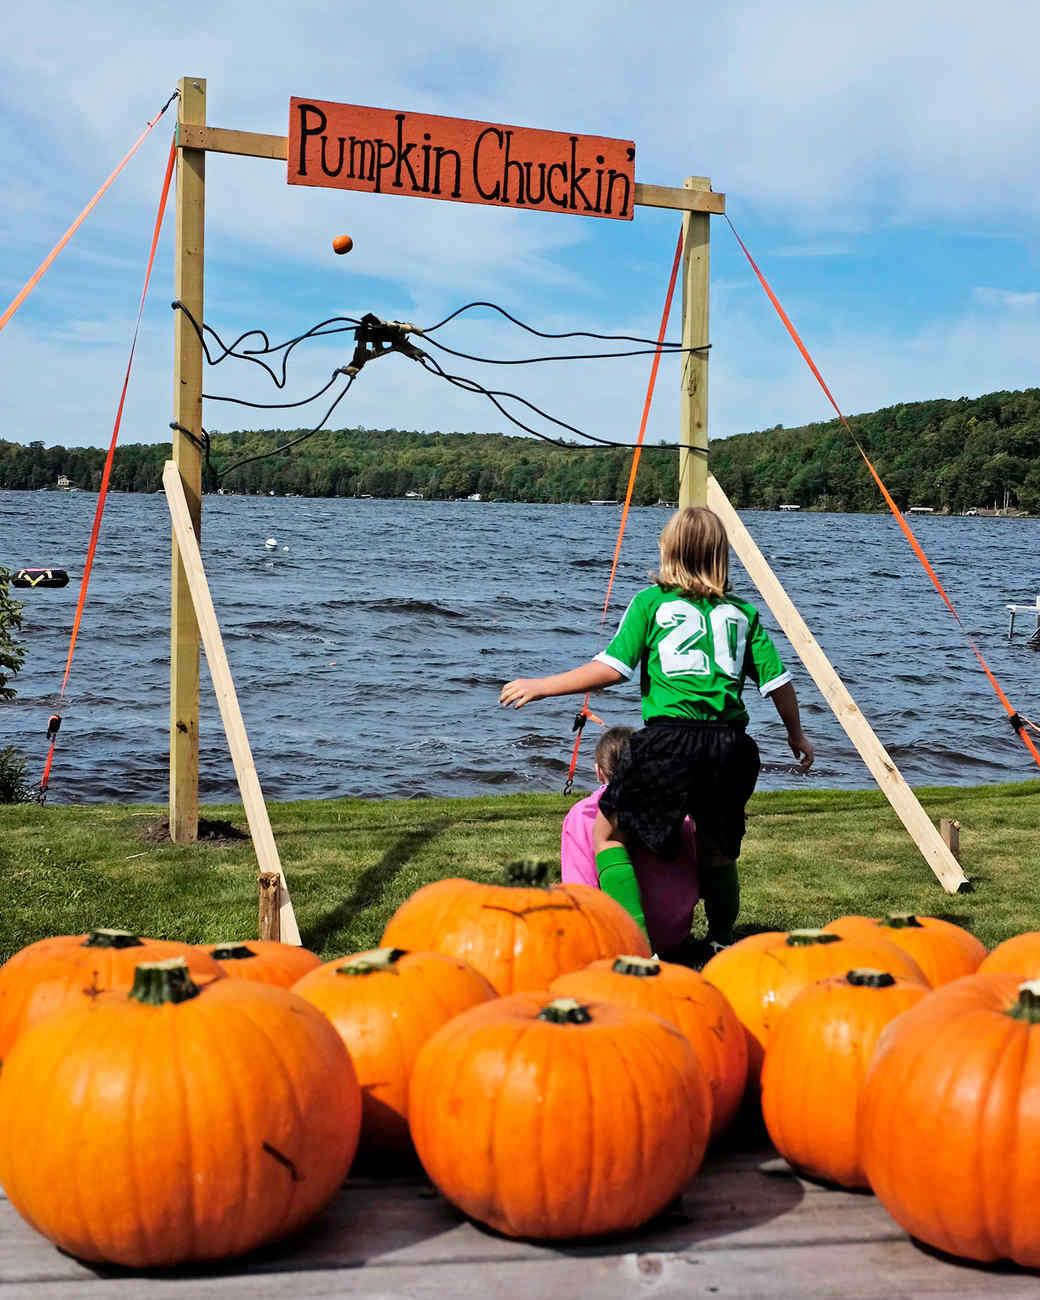 kids chucking pumpkins into lake